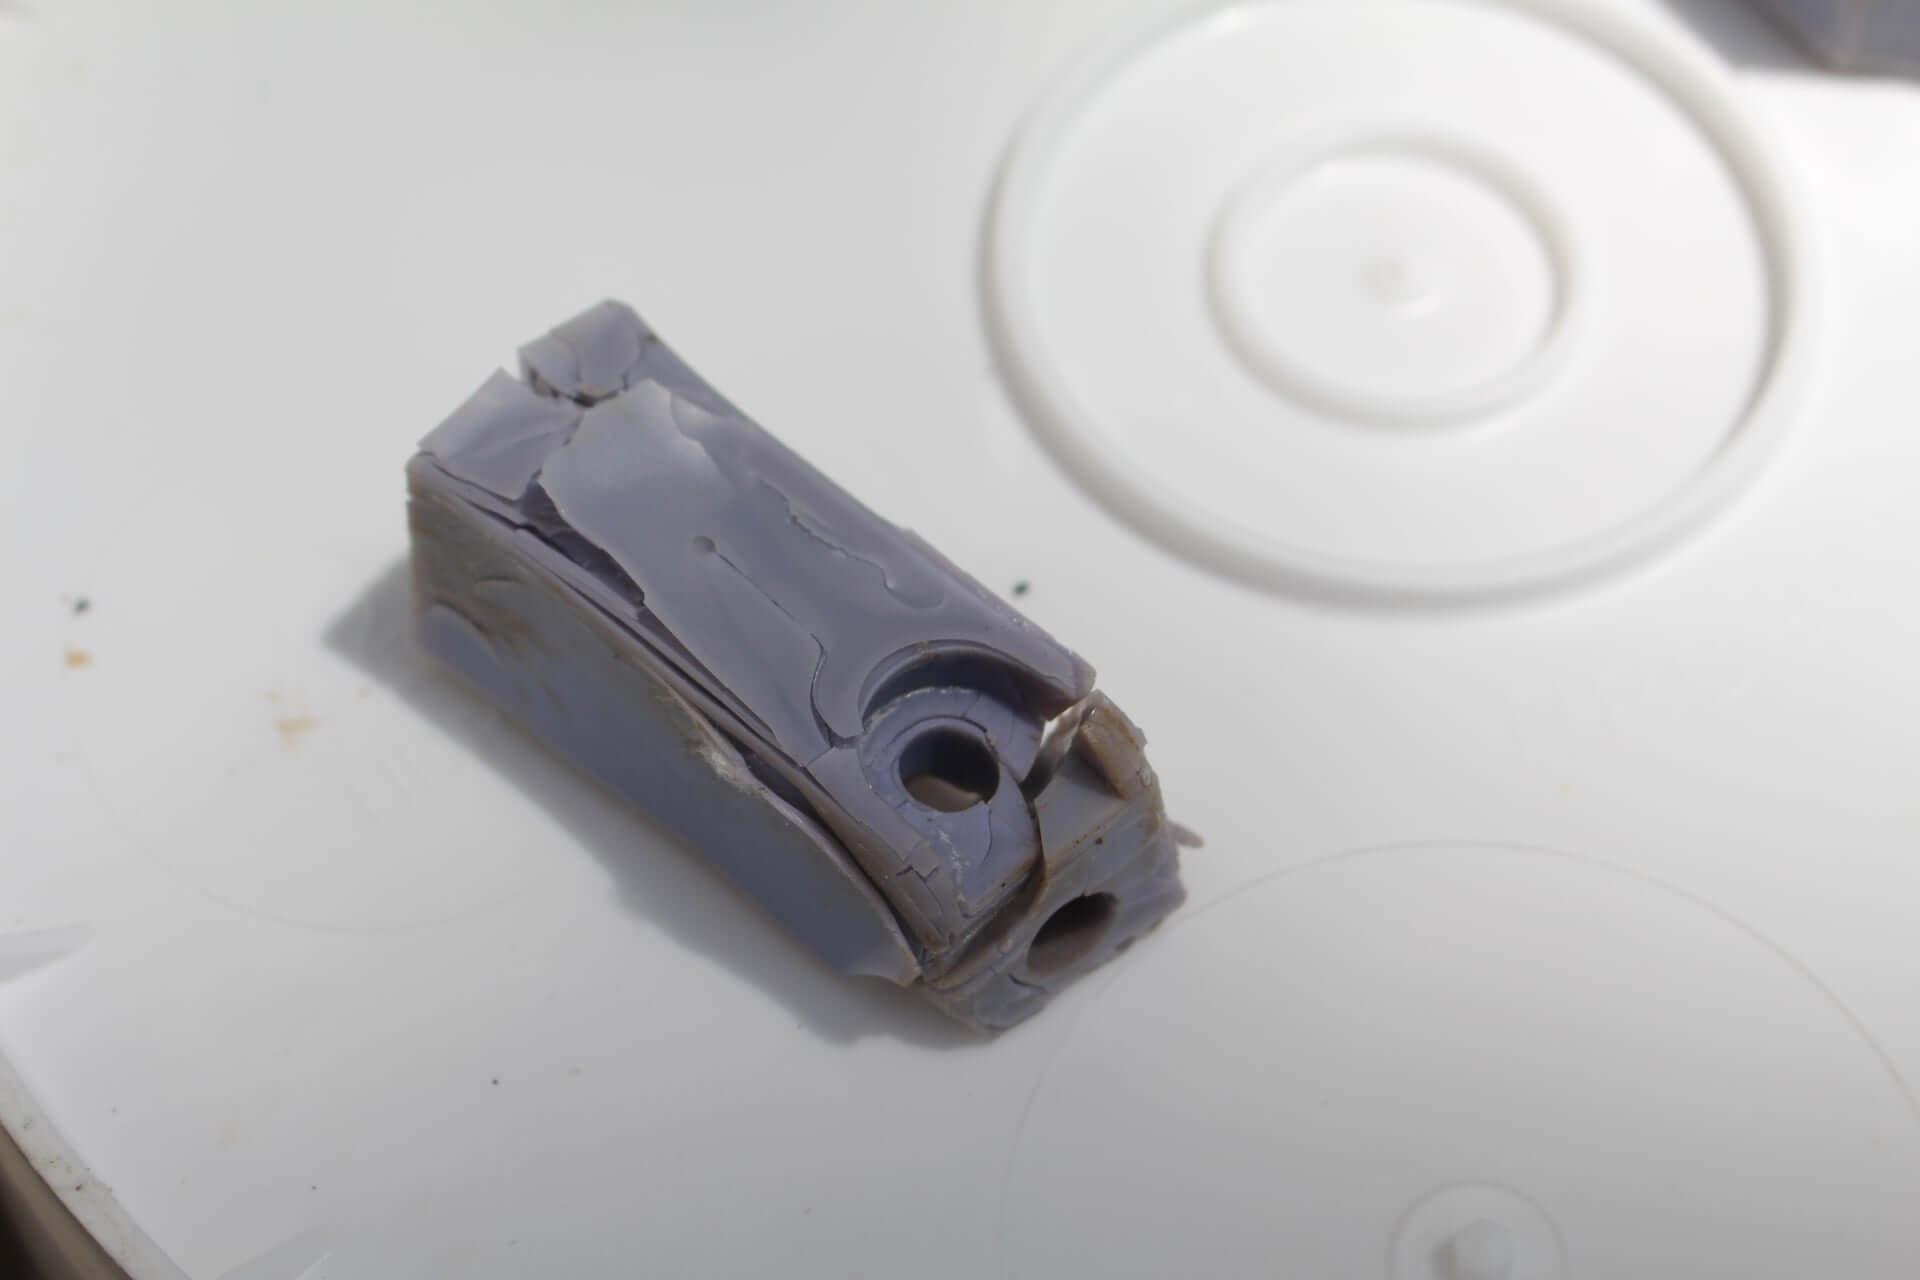 Other Elegoo Water Washable resin tests 2 | ELEGOO Water Washable Resin Review